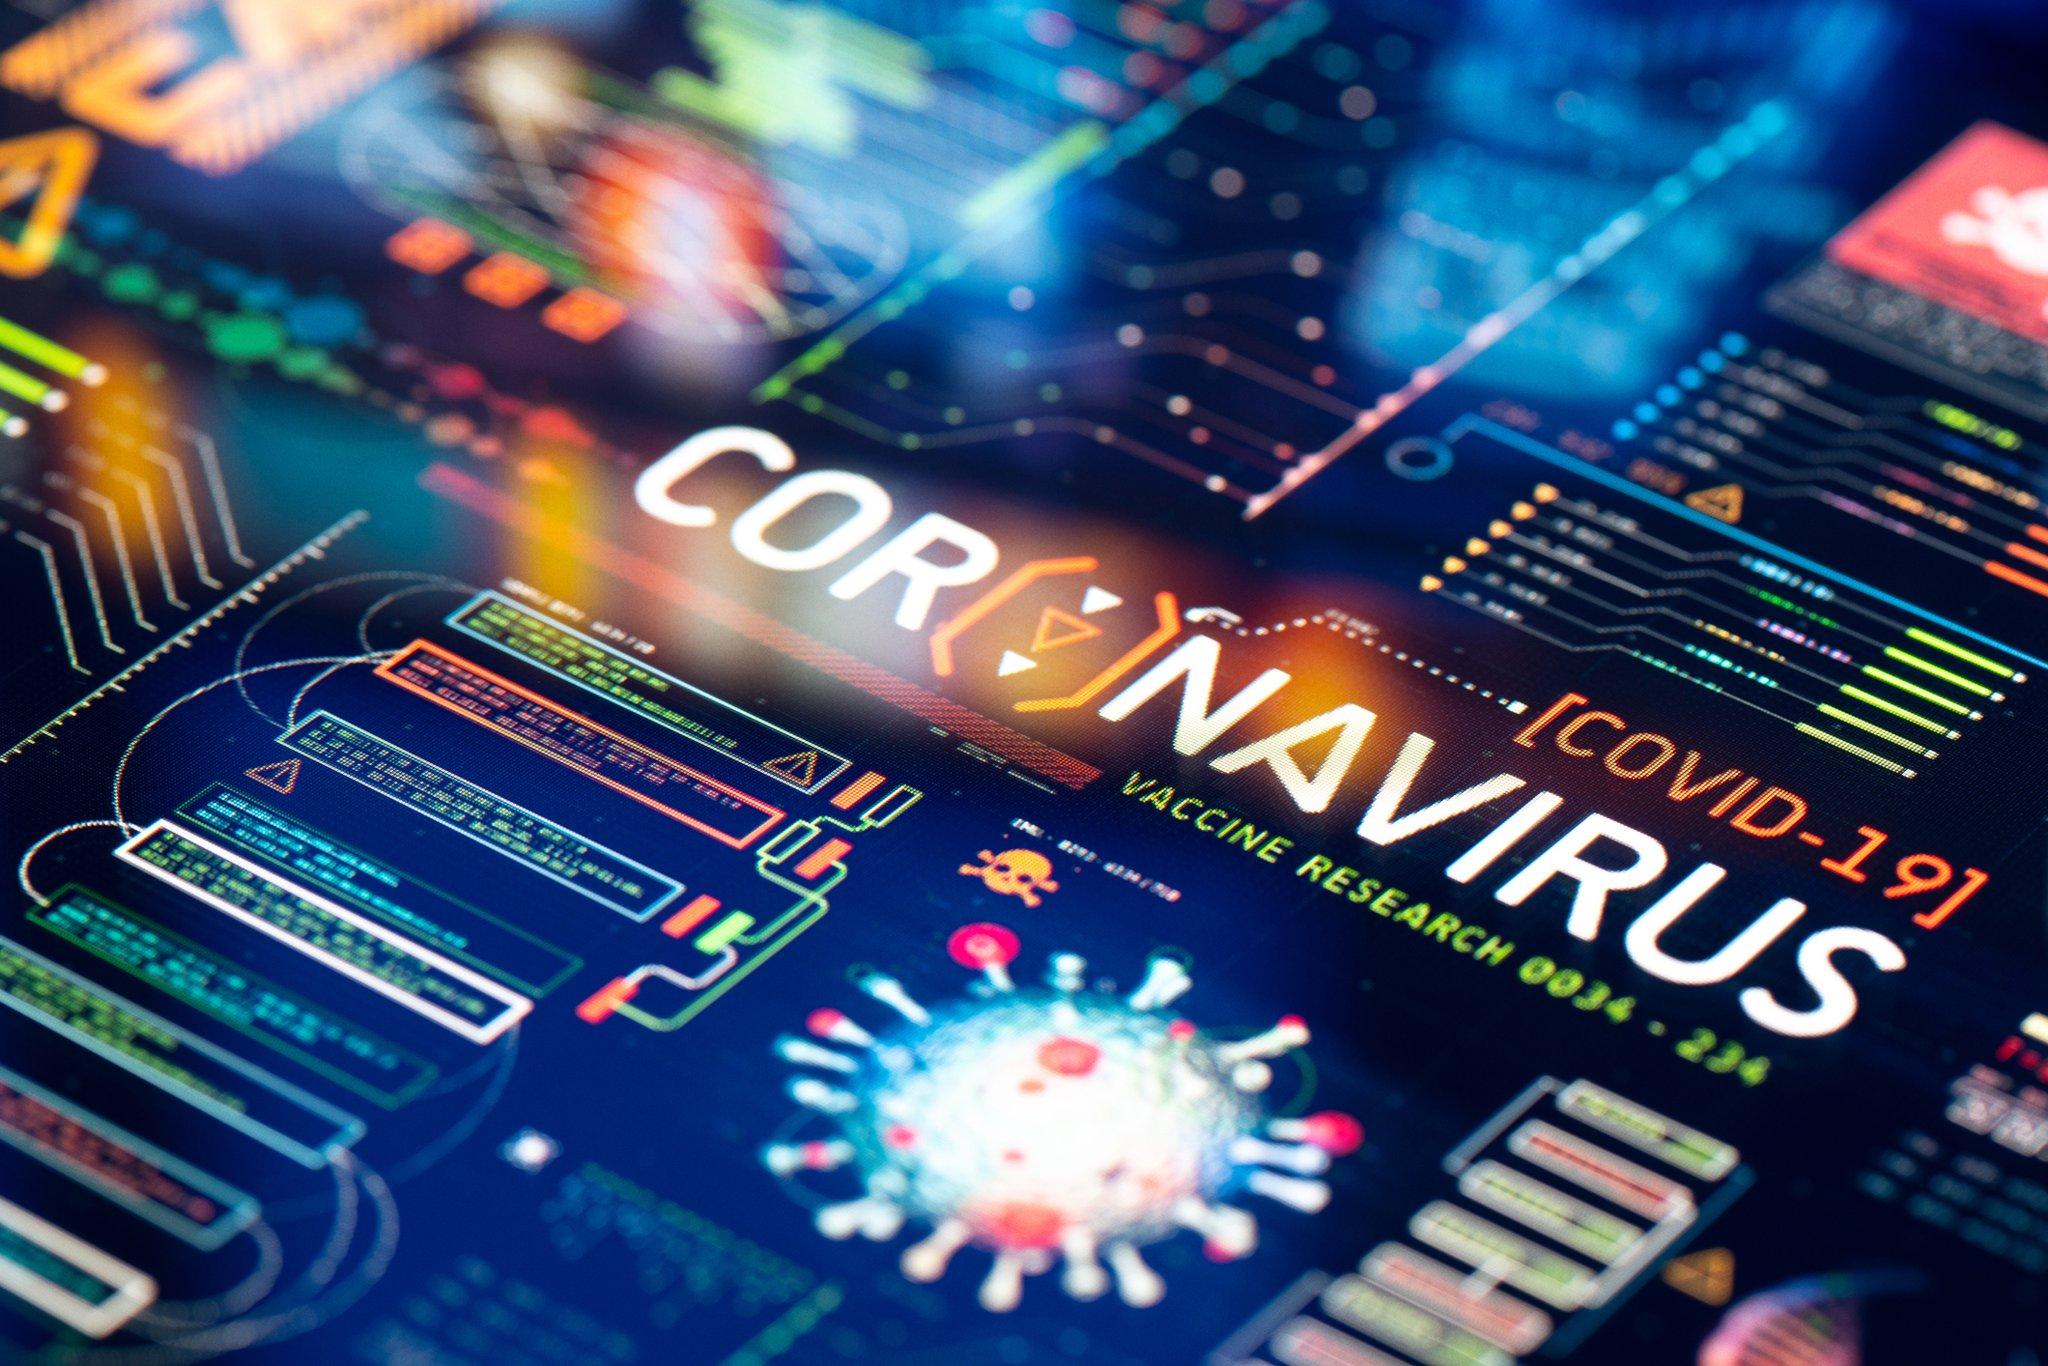 Coronavirus and cybertechnology